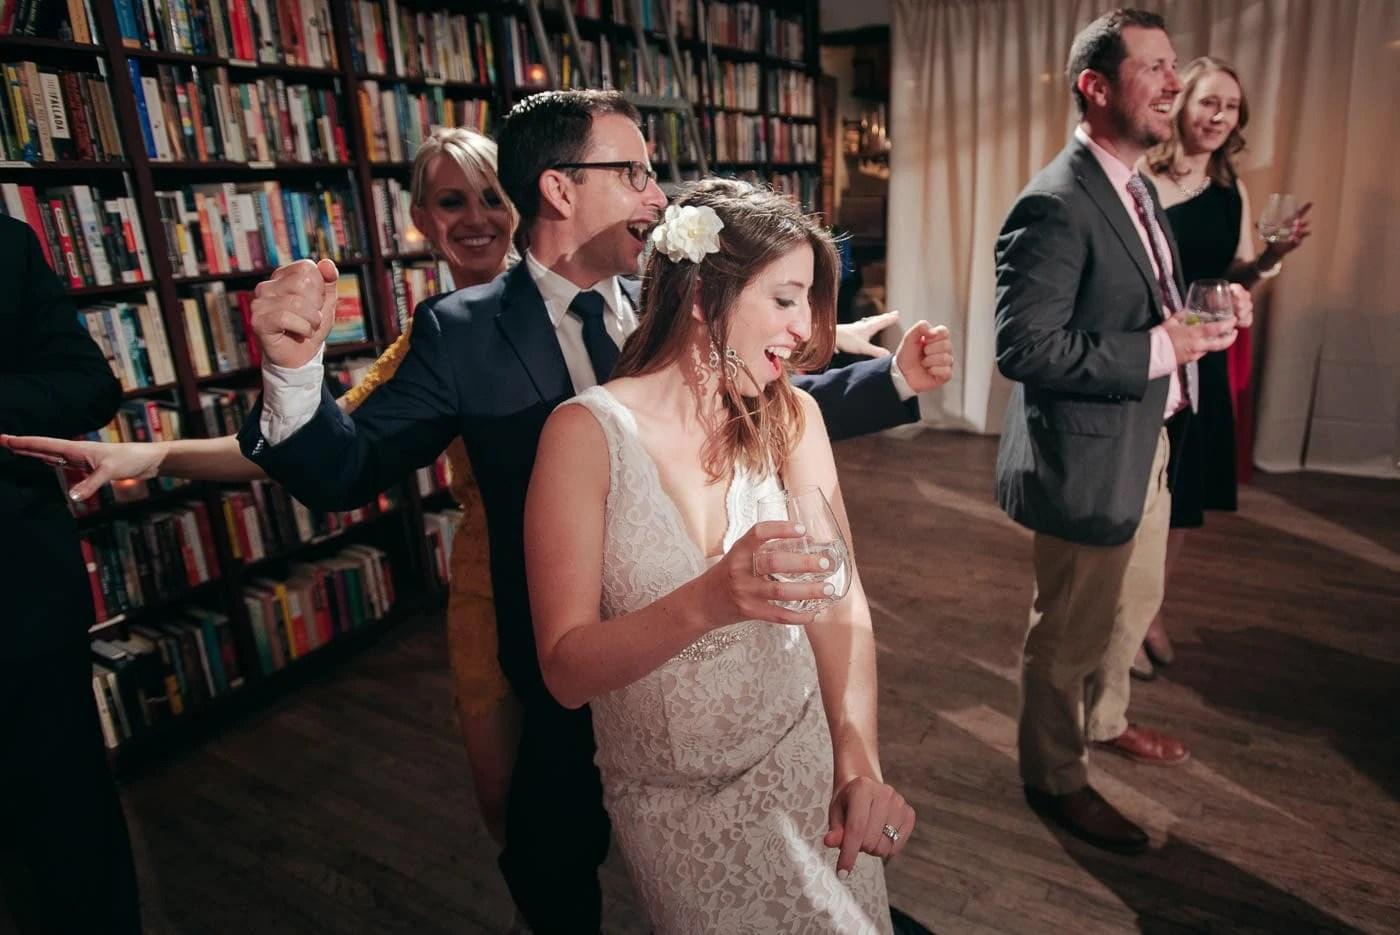 New York Elopement Wedding Reception